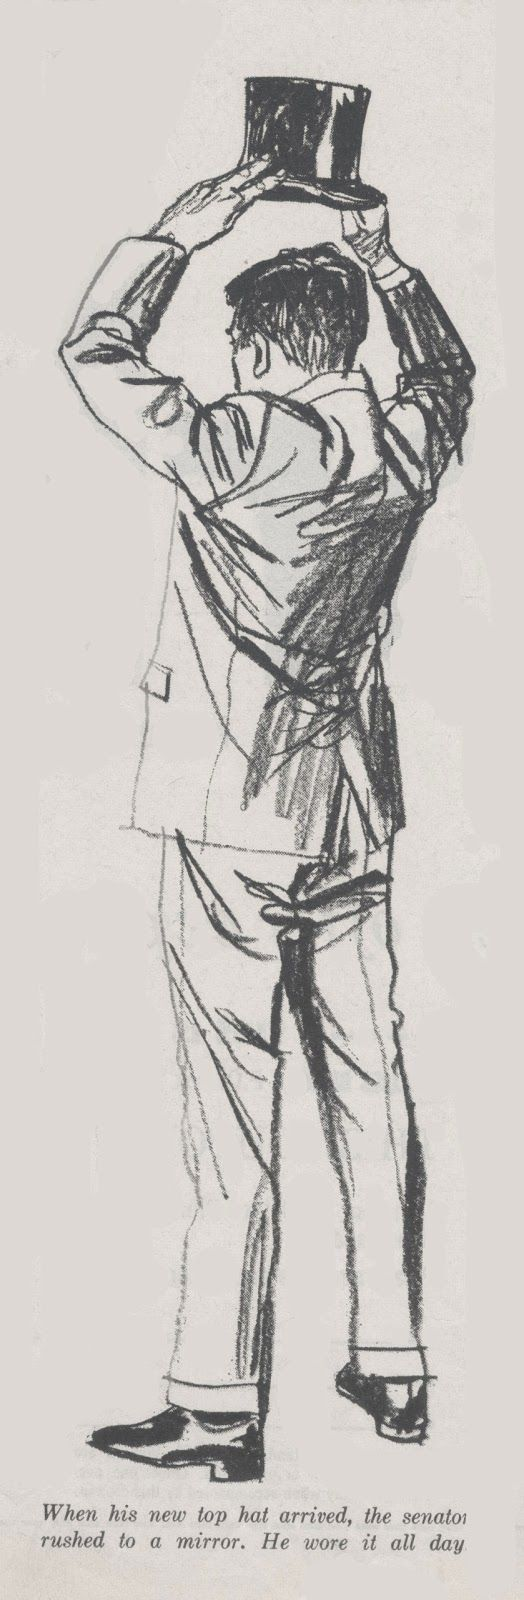 ILLUSTRATION ART: EMPOWERING THE PENCIL